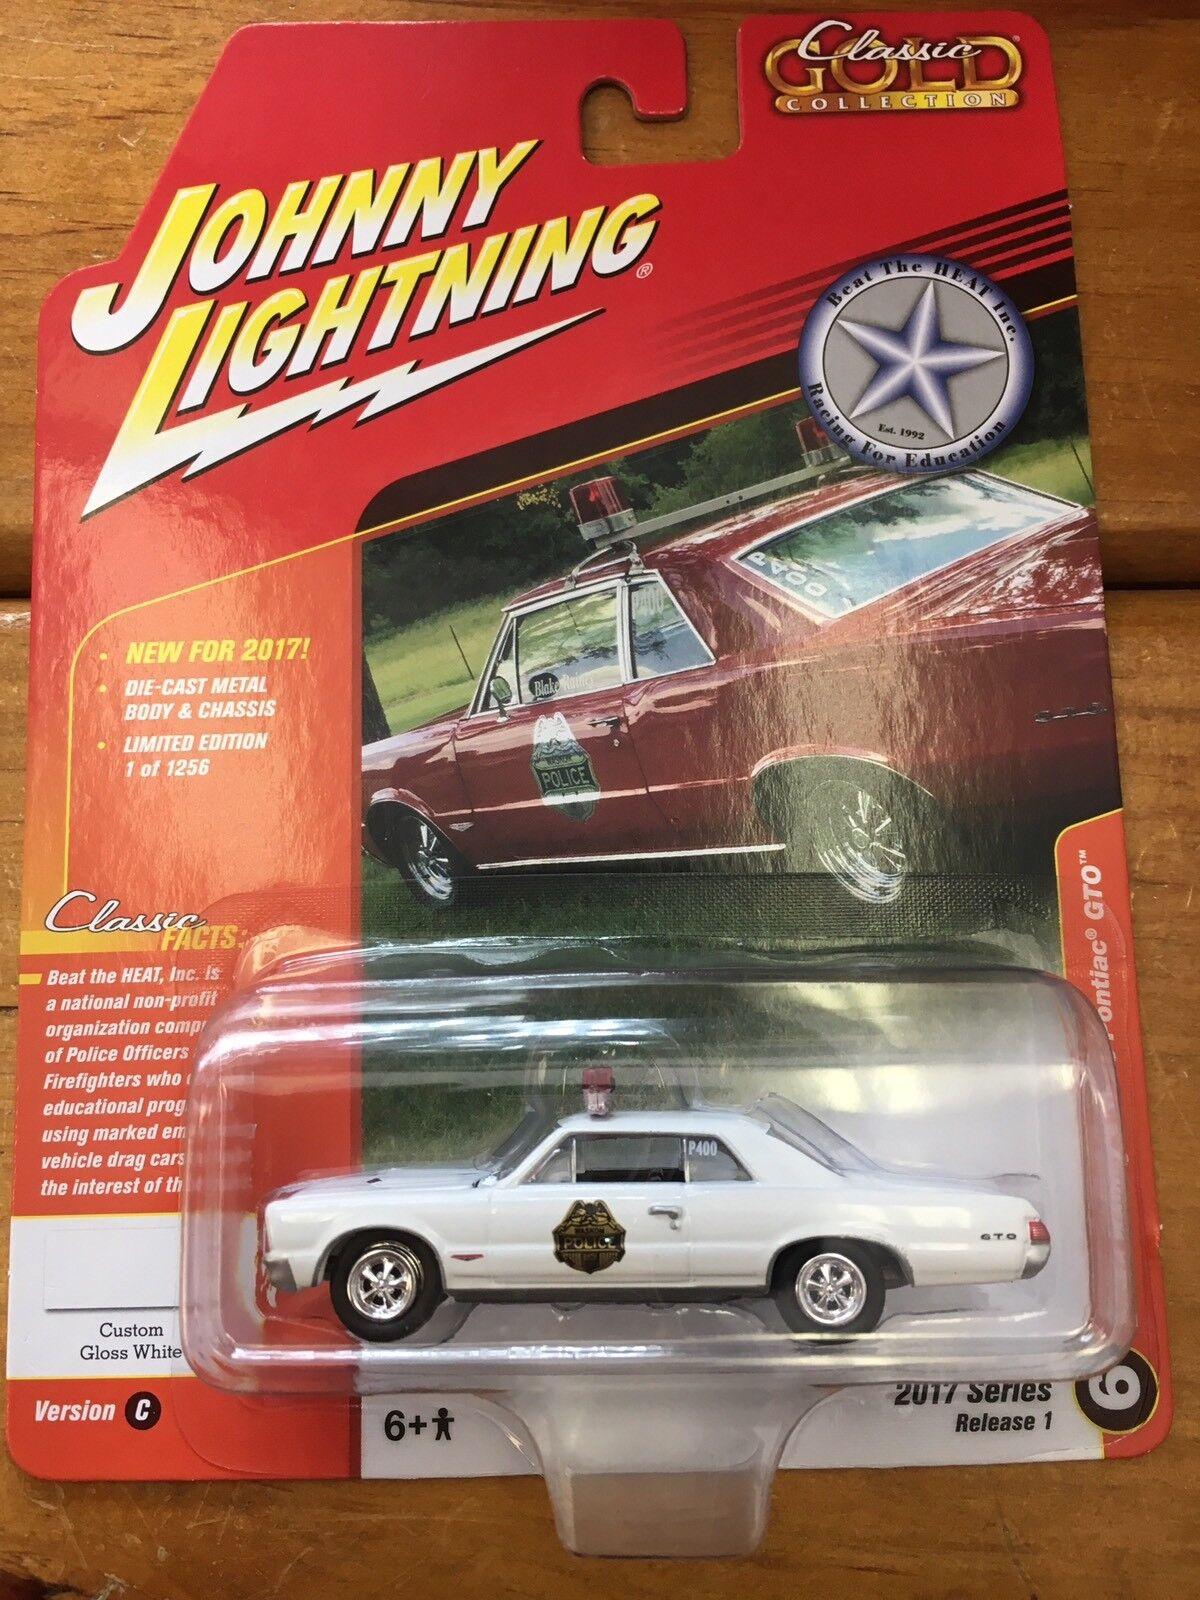 grandes ofertas Johnny Lightning Blake Rainey's 1965 Pontiac Gto Clásico oro oro oro 2017 versión 1  n ° 1 en línea